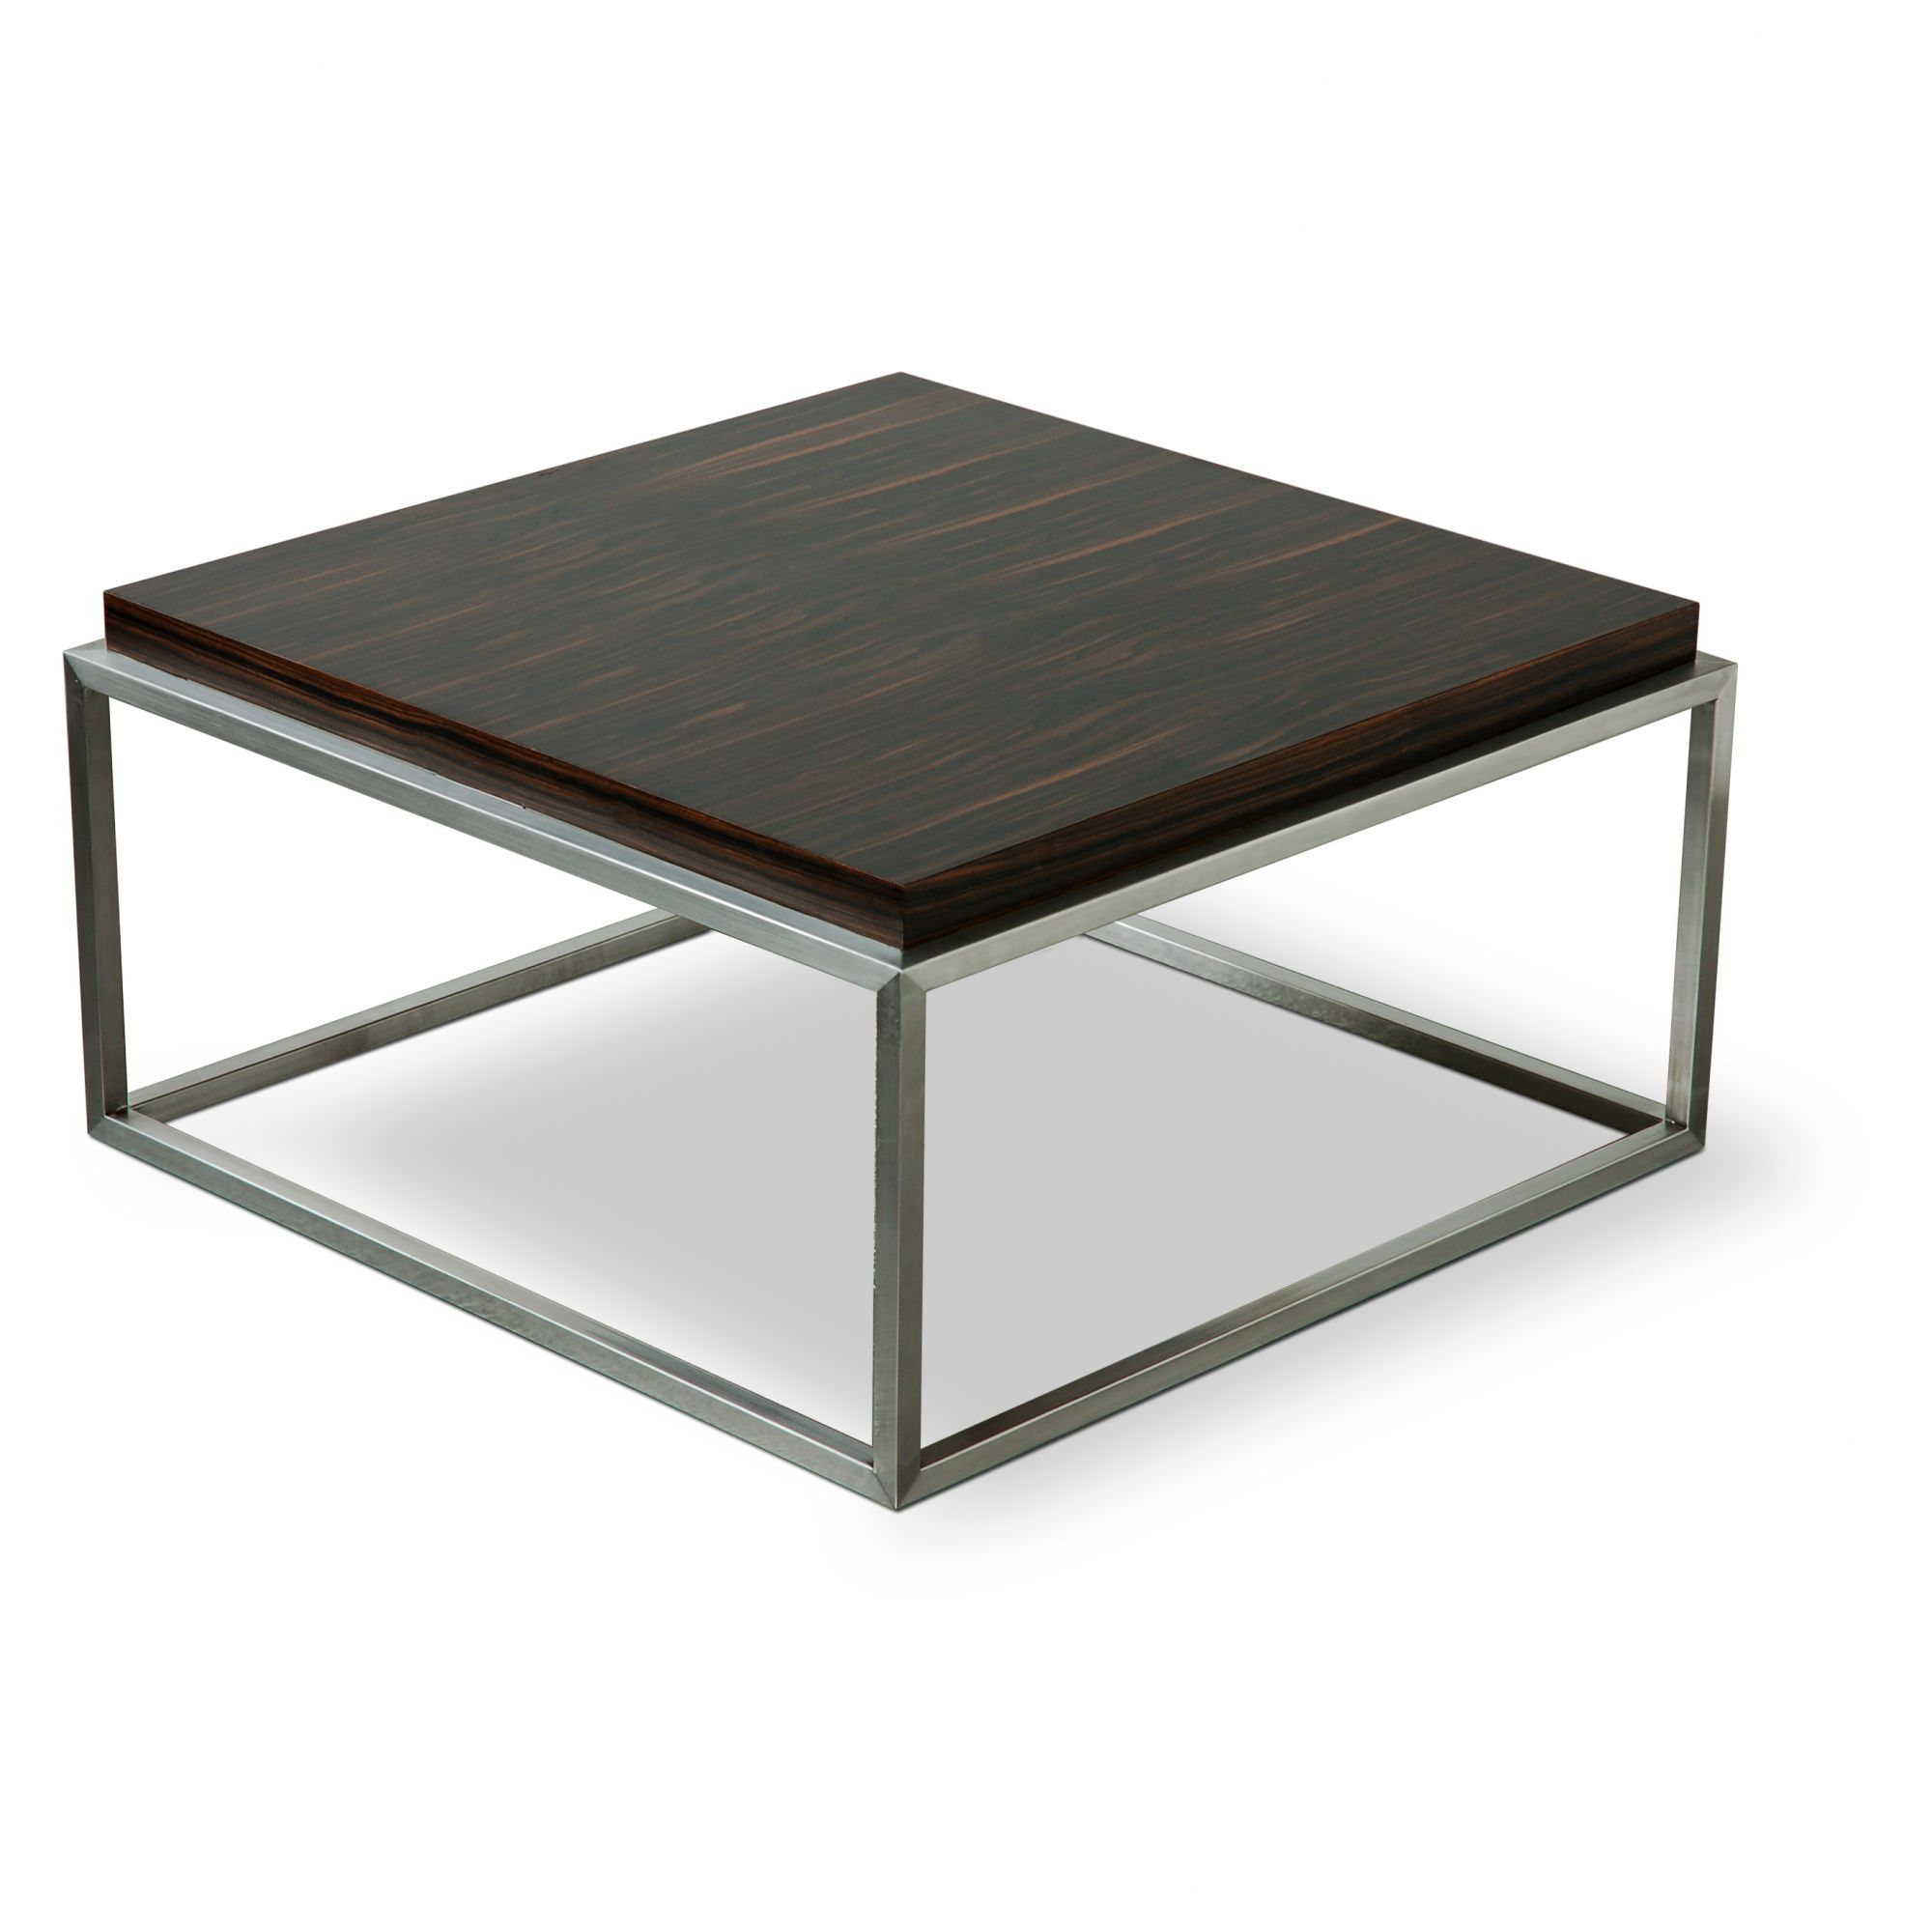 Gus Modern Drake Coffee Table All Modern Coffee Table Coffee Table White Coffee Table Square [ 2000 x 2000 Pixel ]